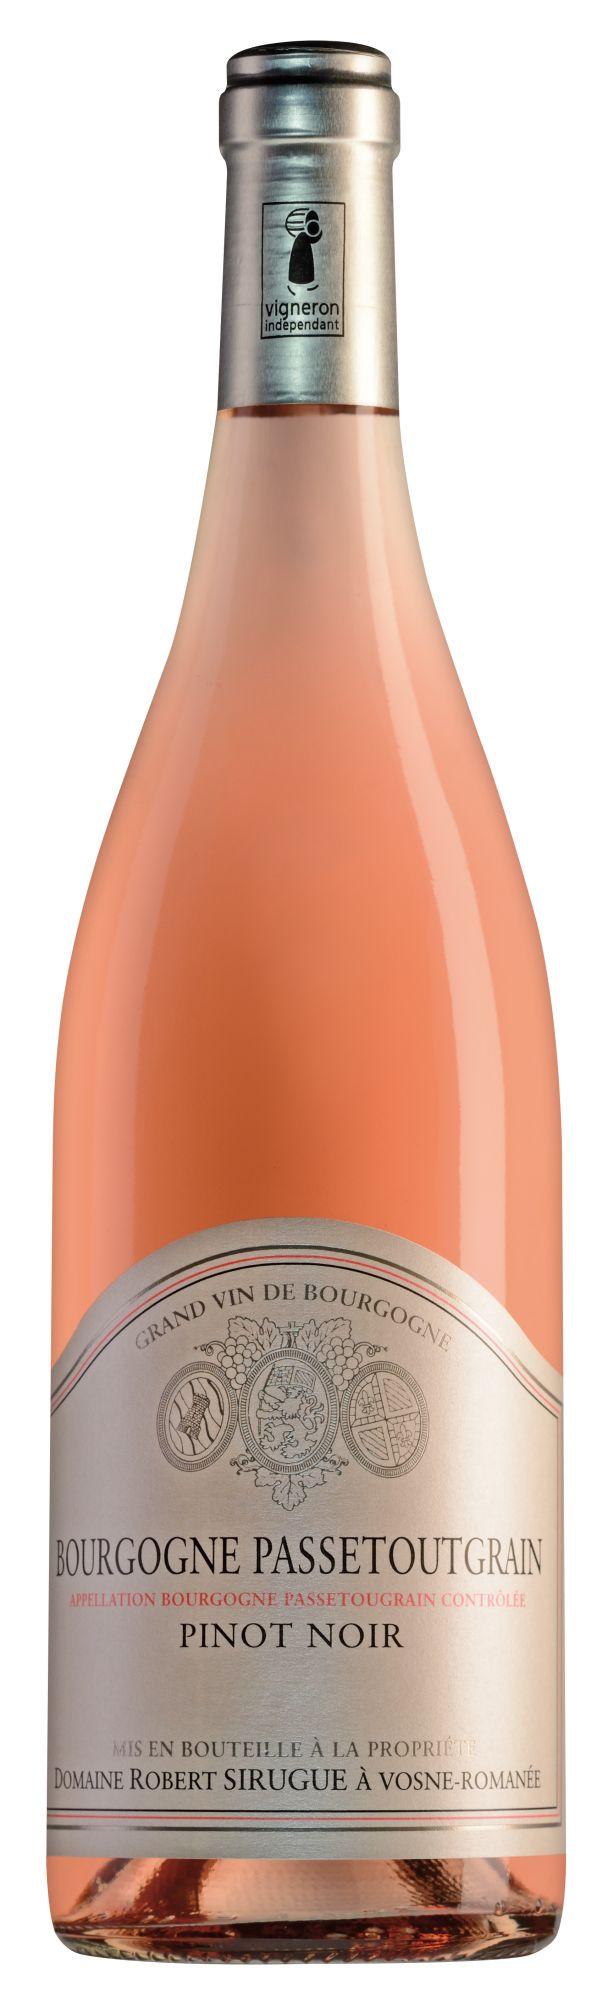 Domaine Robert Sirugue Bourgogne Passetoutgrain rosé